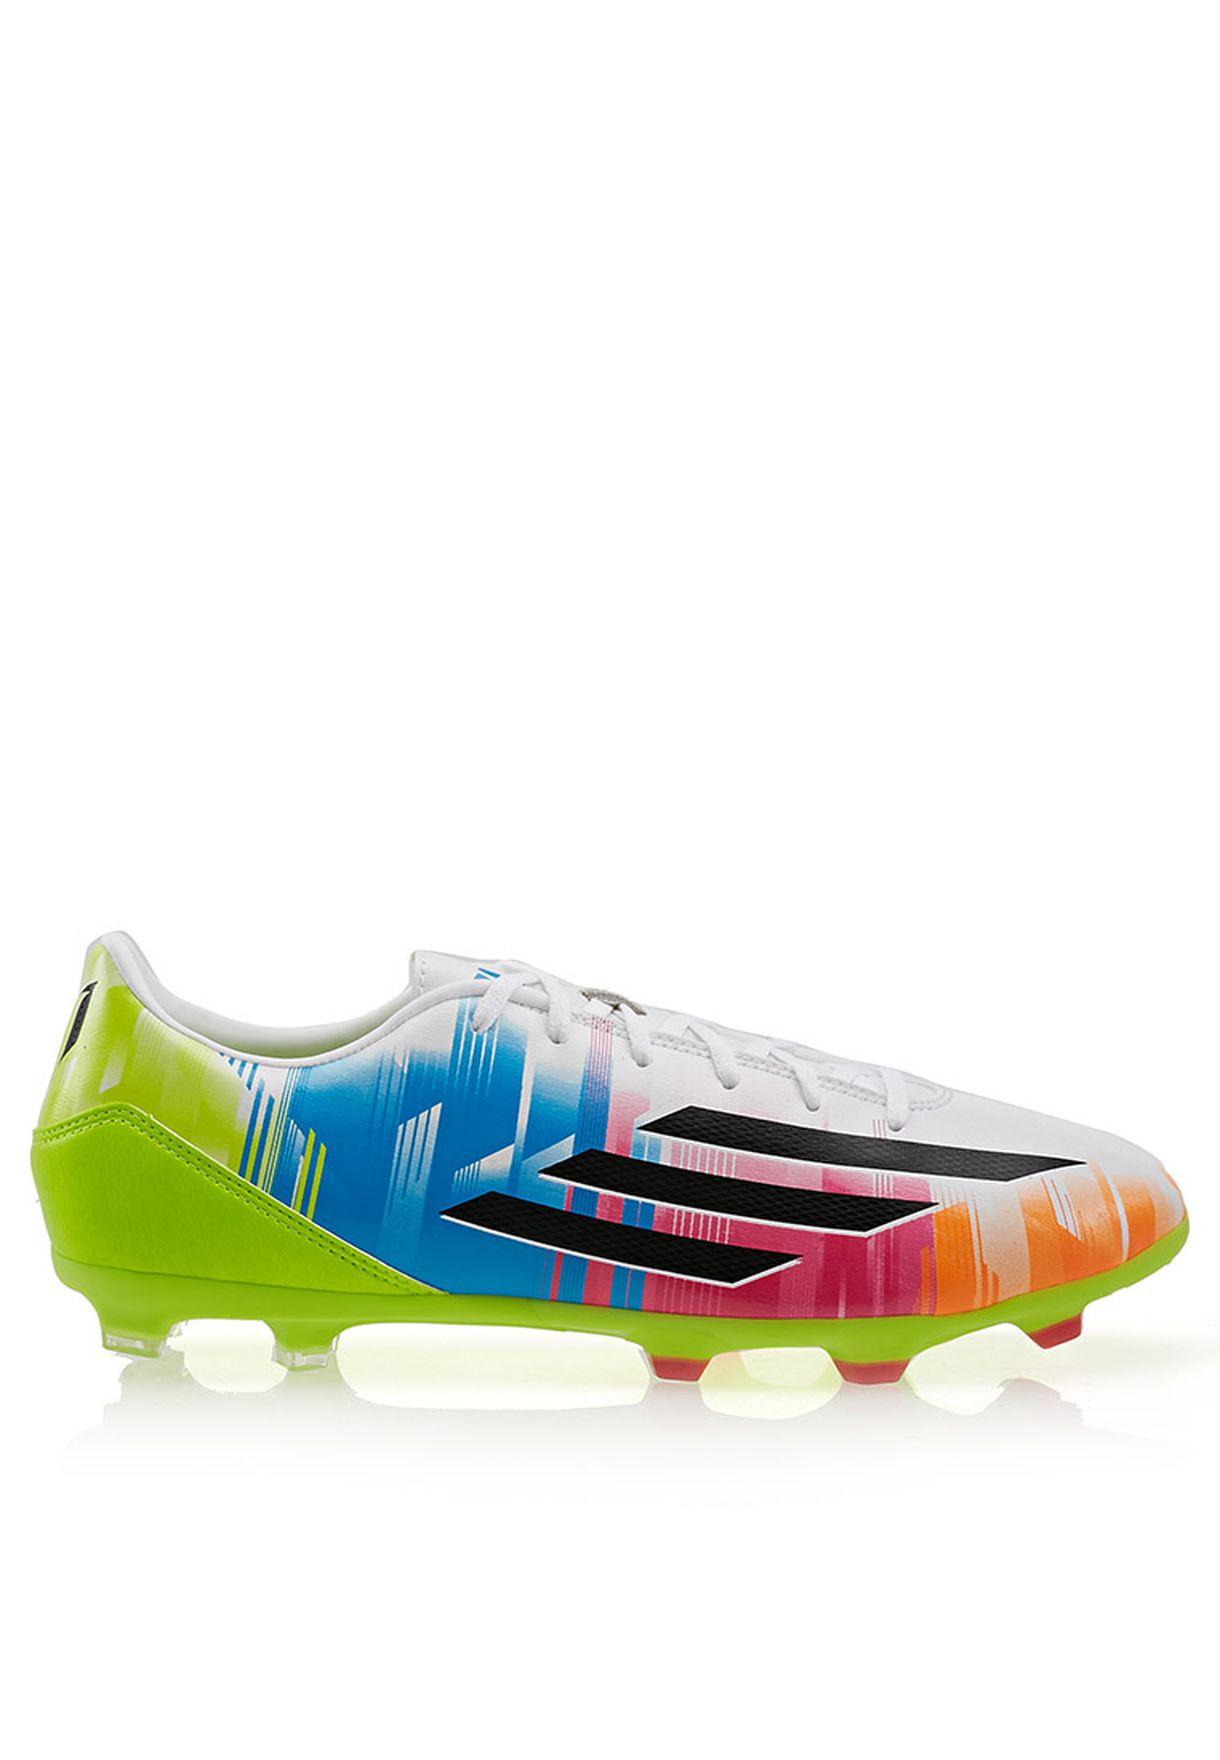 the latest 09e96 9a39f F10 TRX FG Messi